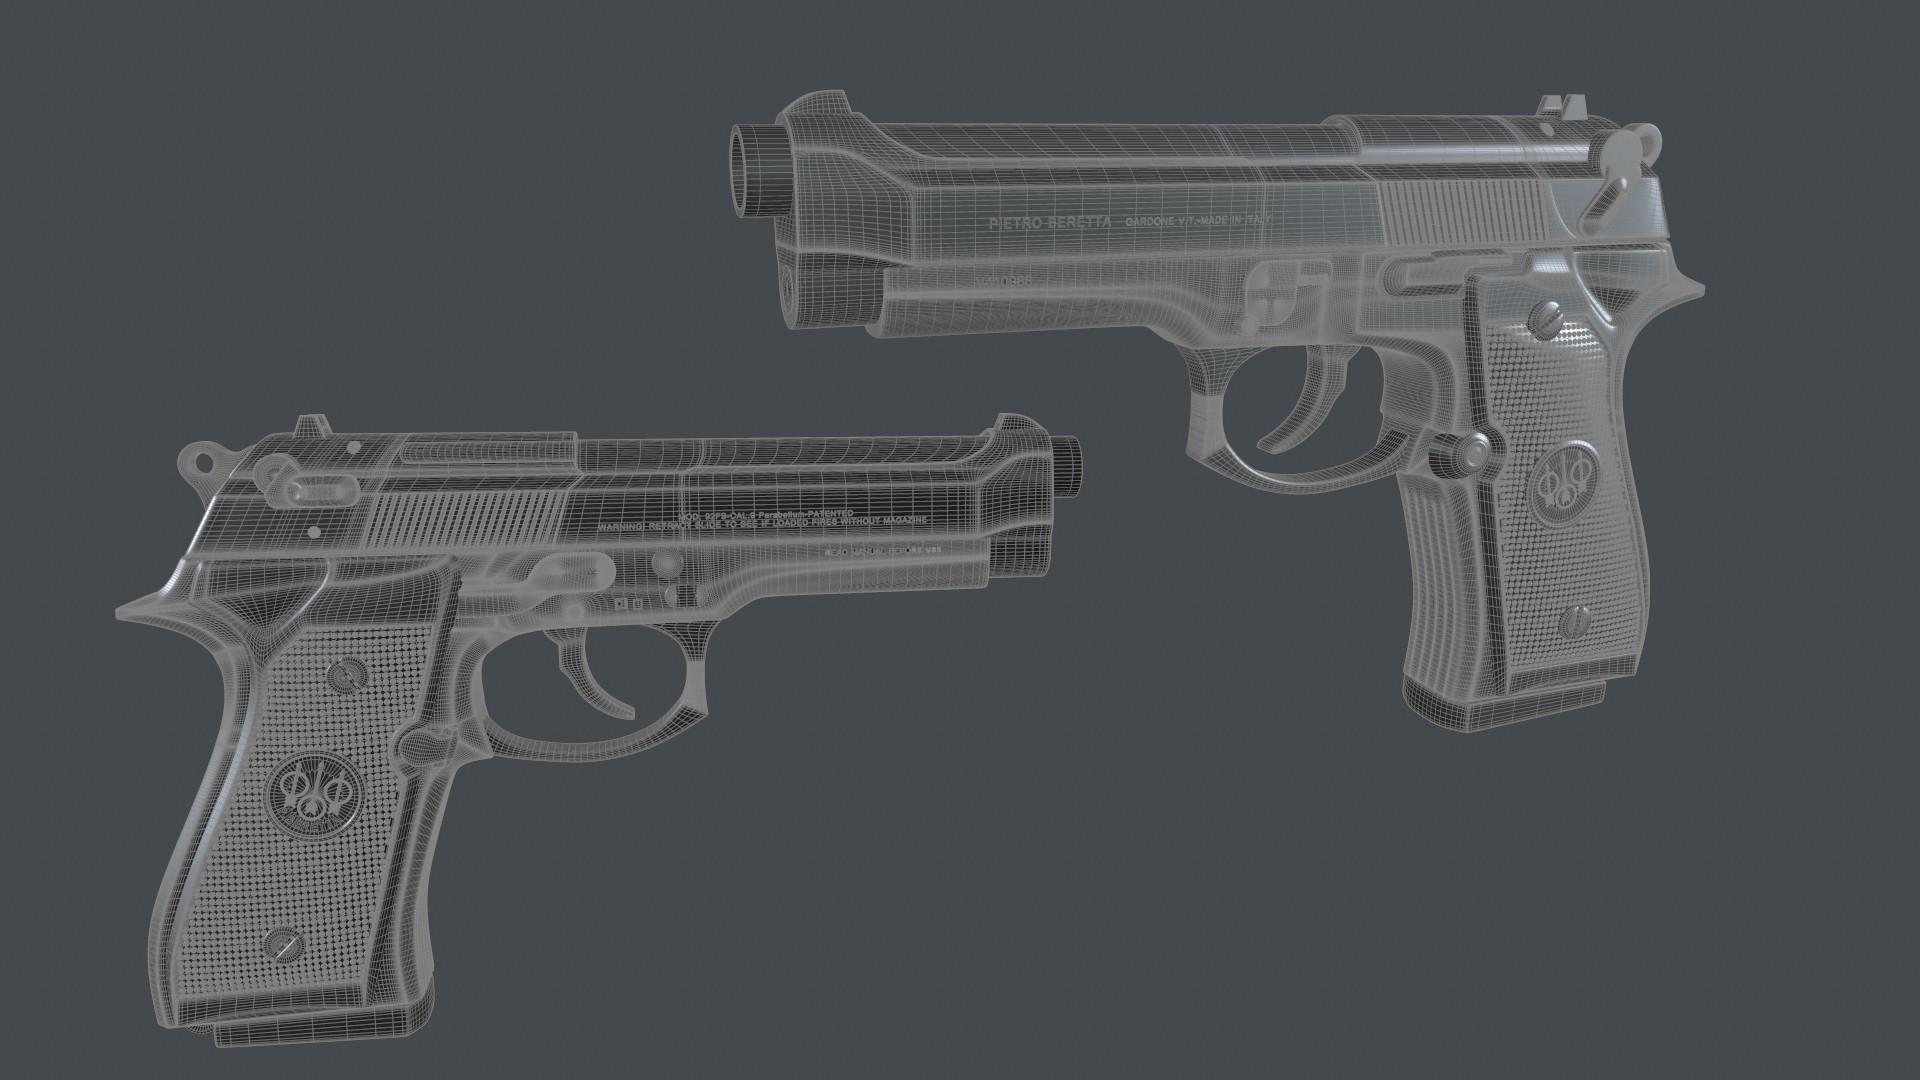 Beretta - Wireframe